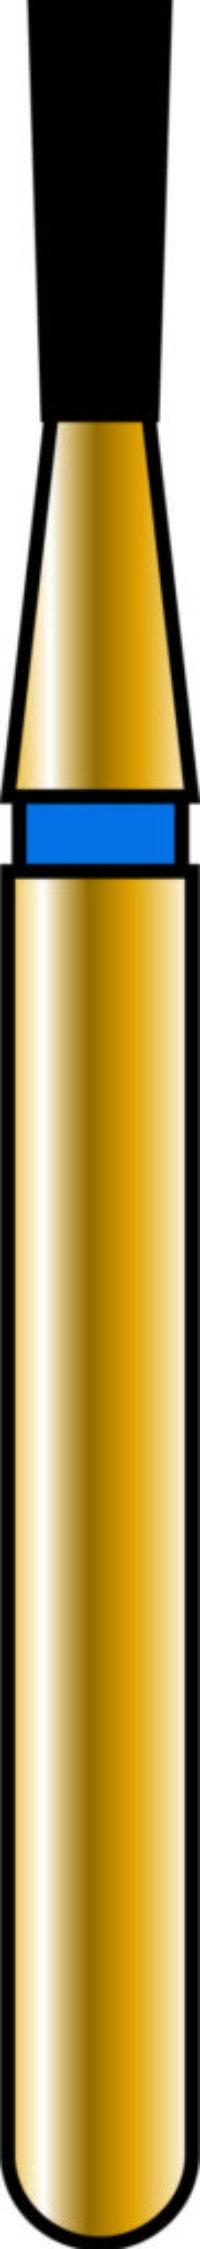 Inverted Cone 12-3.5mm Gold Diamond Bur - Coarse Grit